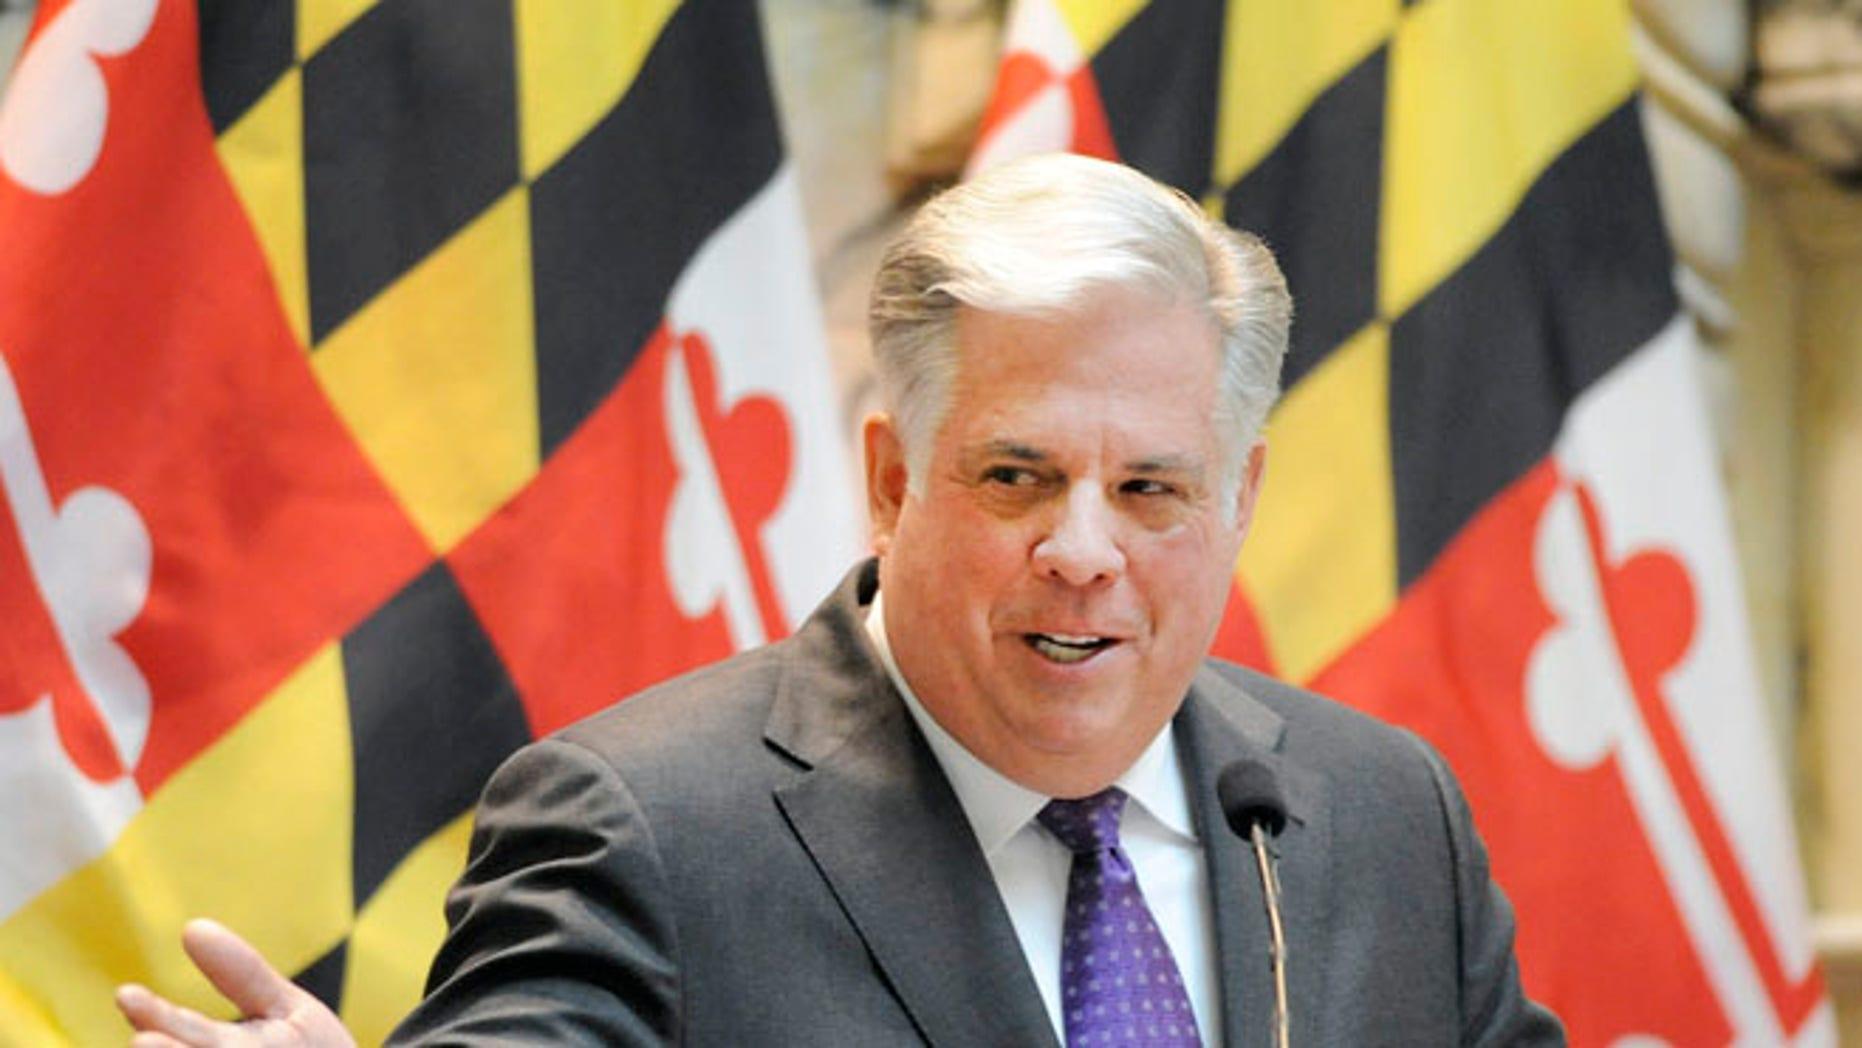 FILE: Feb. 4, 2015: Maryland Gov. Larry Hogan in Annapolis, Md.